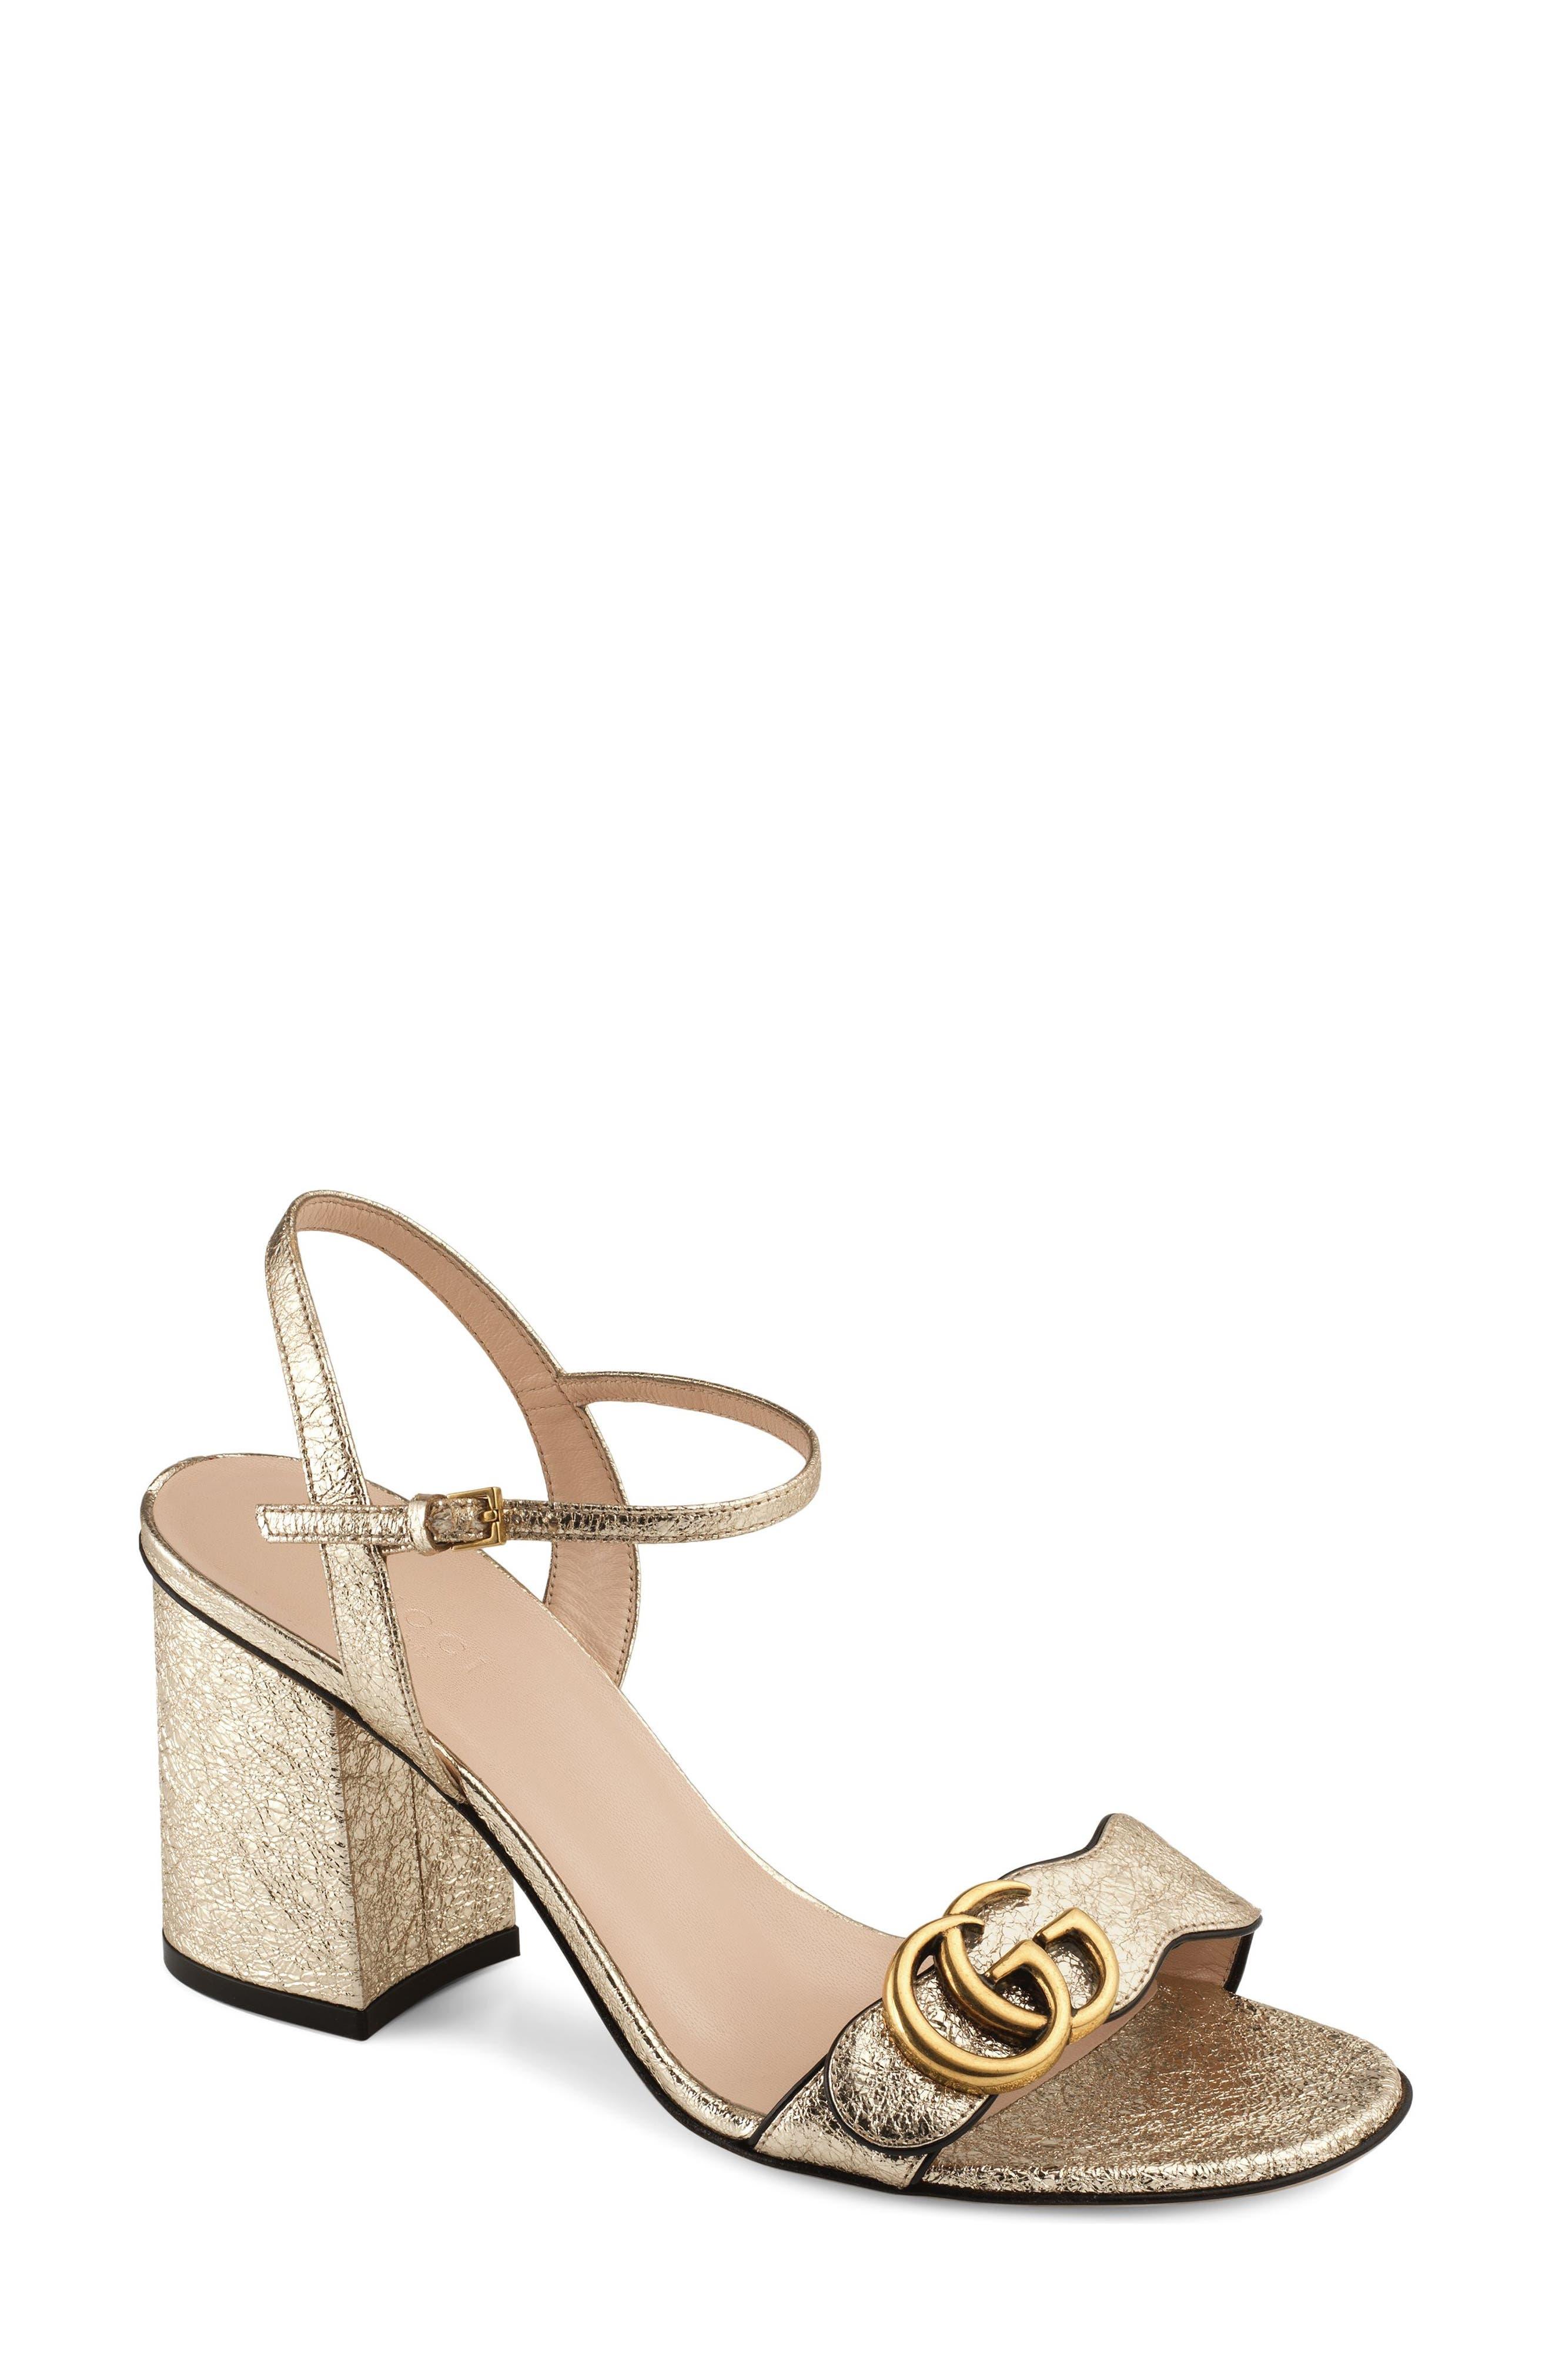 GUCCI GG Marmont Sandal, Main, color, METALLIC GOLD